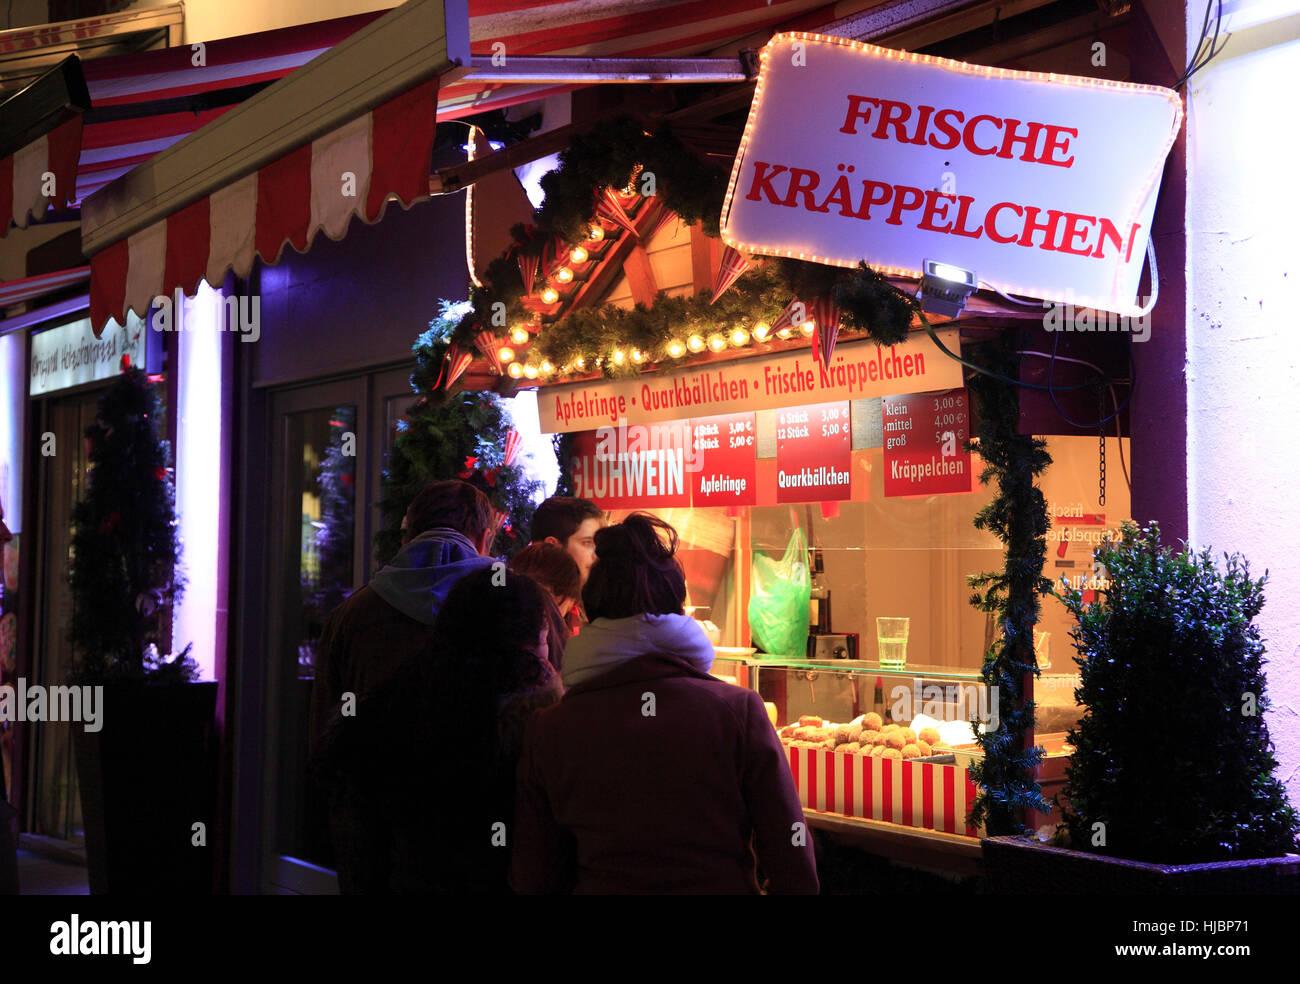 Stand mit Schmalzgebaeck, Saxony, Germany, Europe Stock Photo